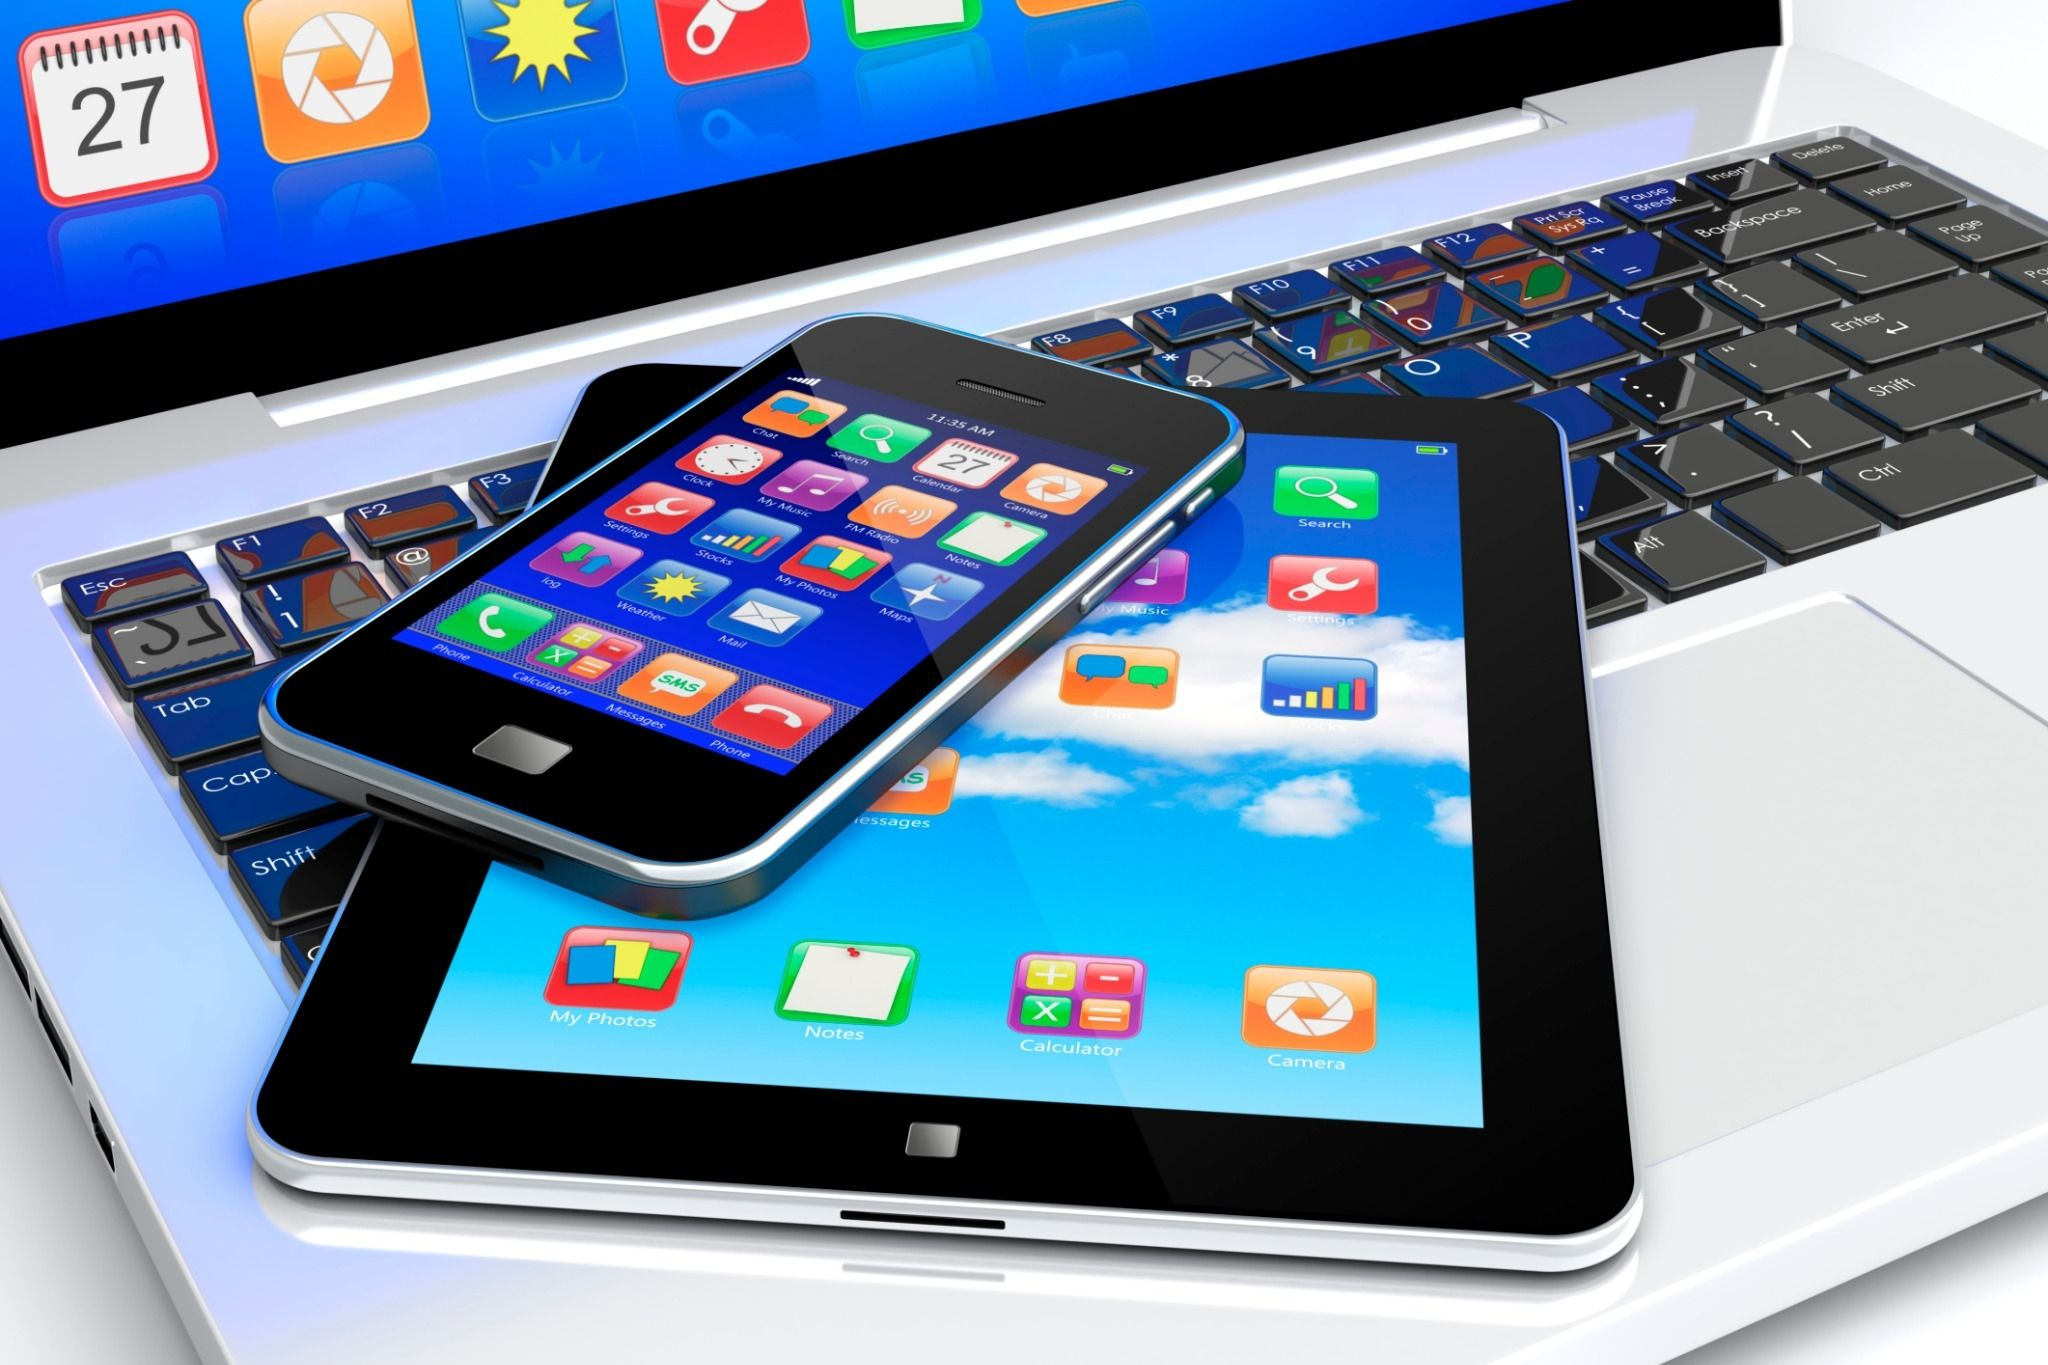 Buy cheap cell phones, audio, laptops, PCs, Computers